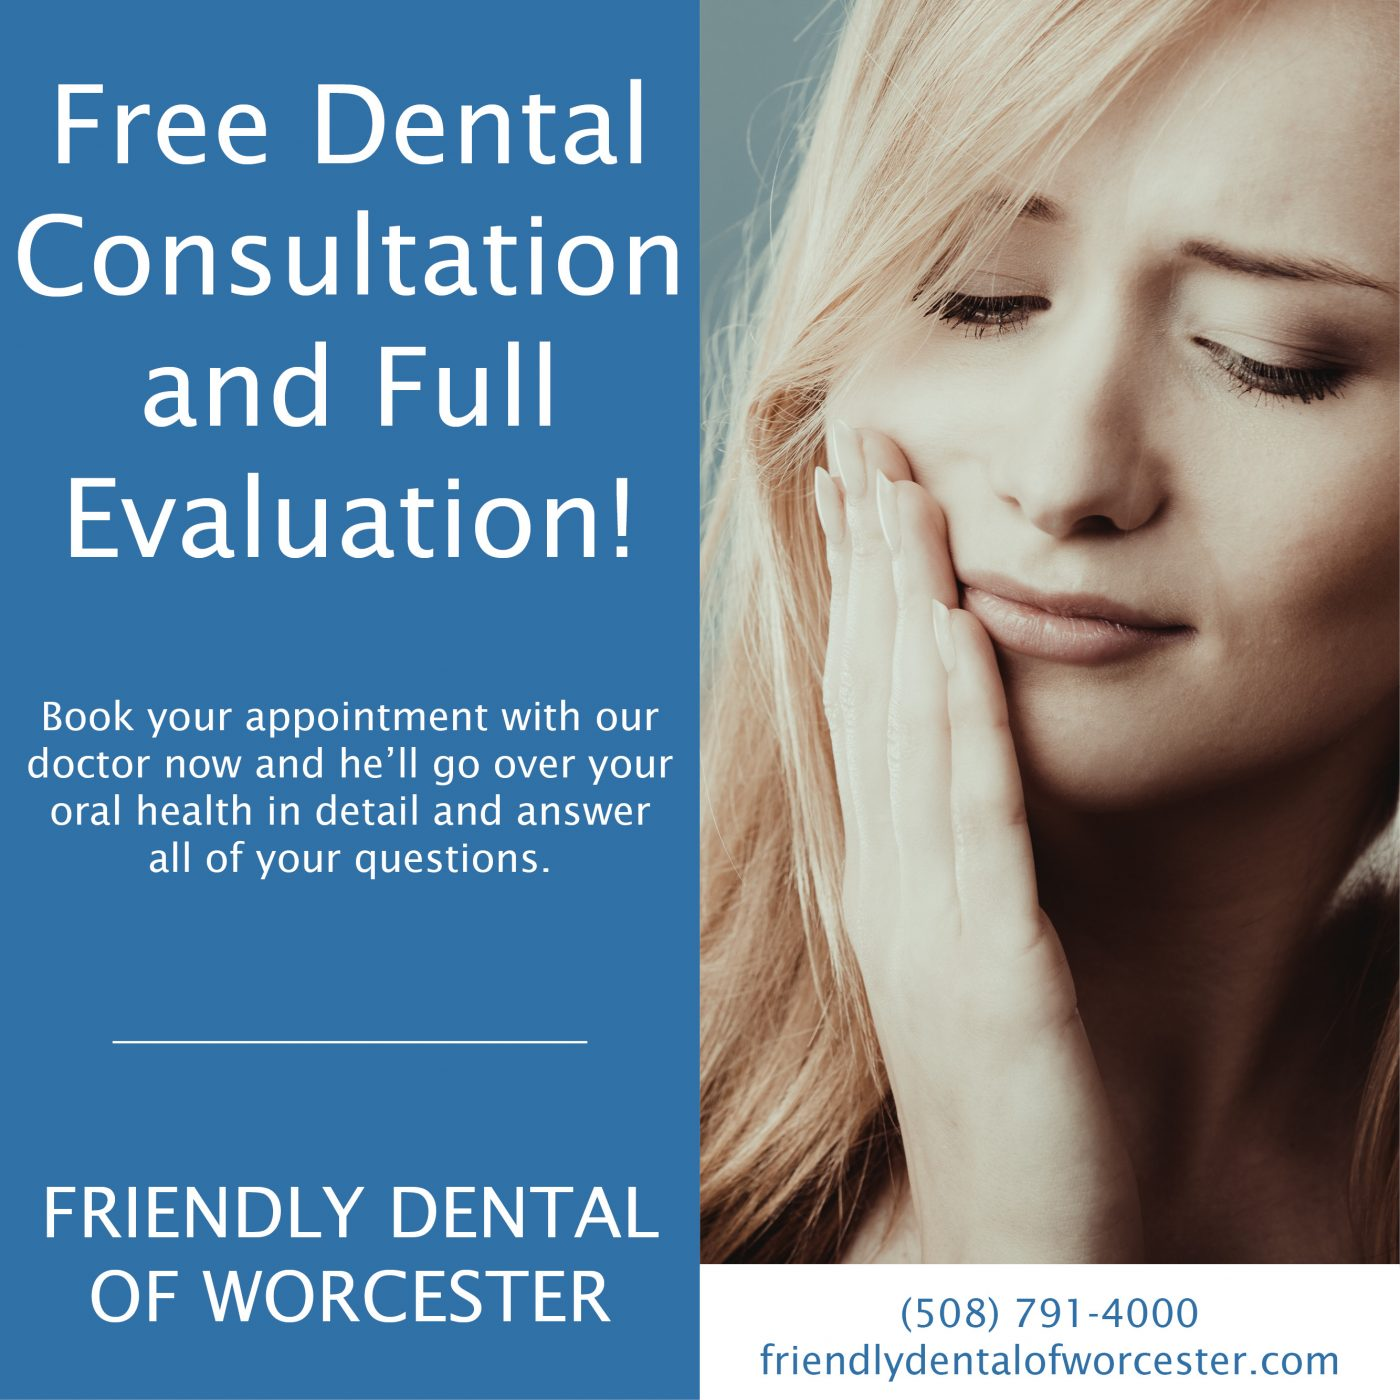 Complete Free Dental Consultation Evaluation Unique Dental Of Putnam